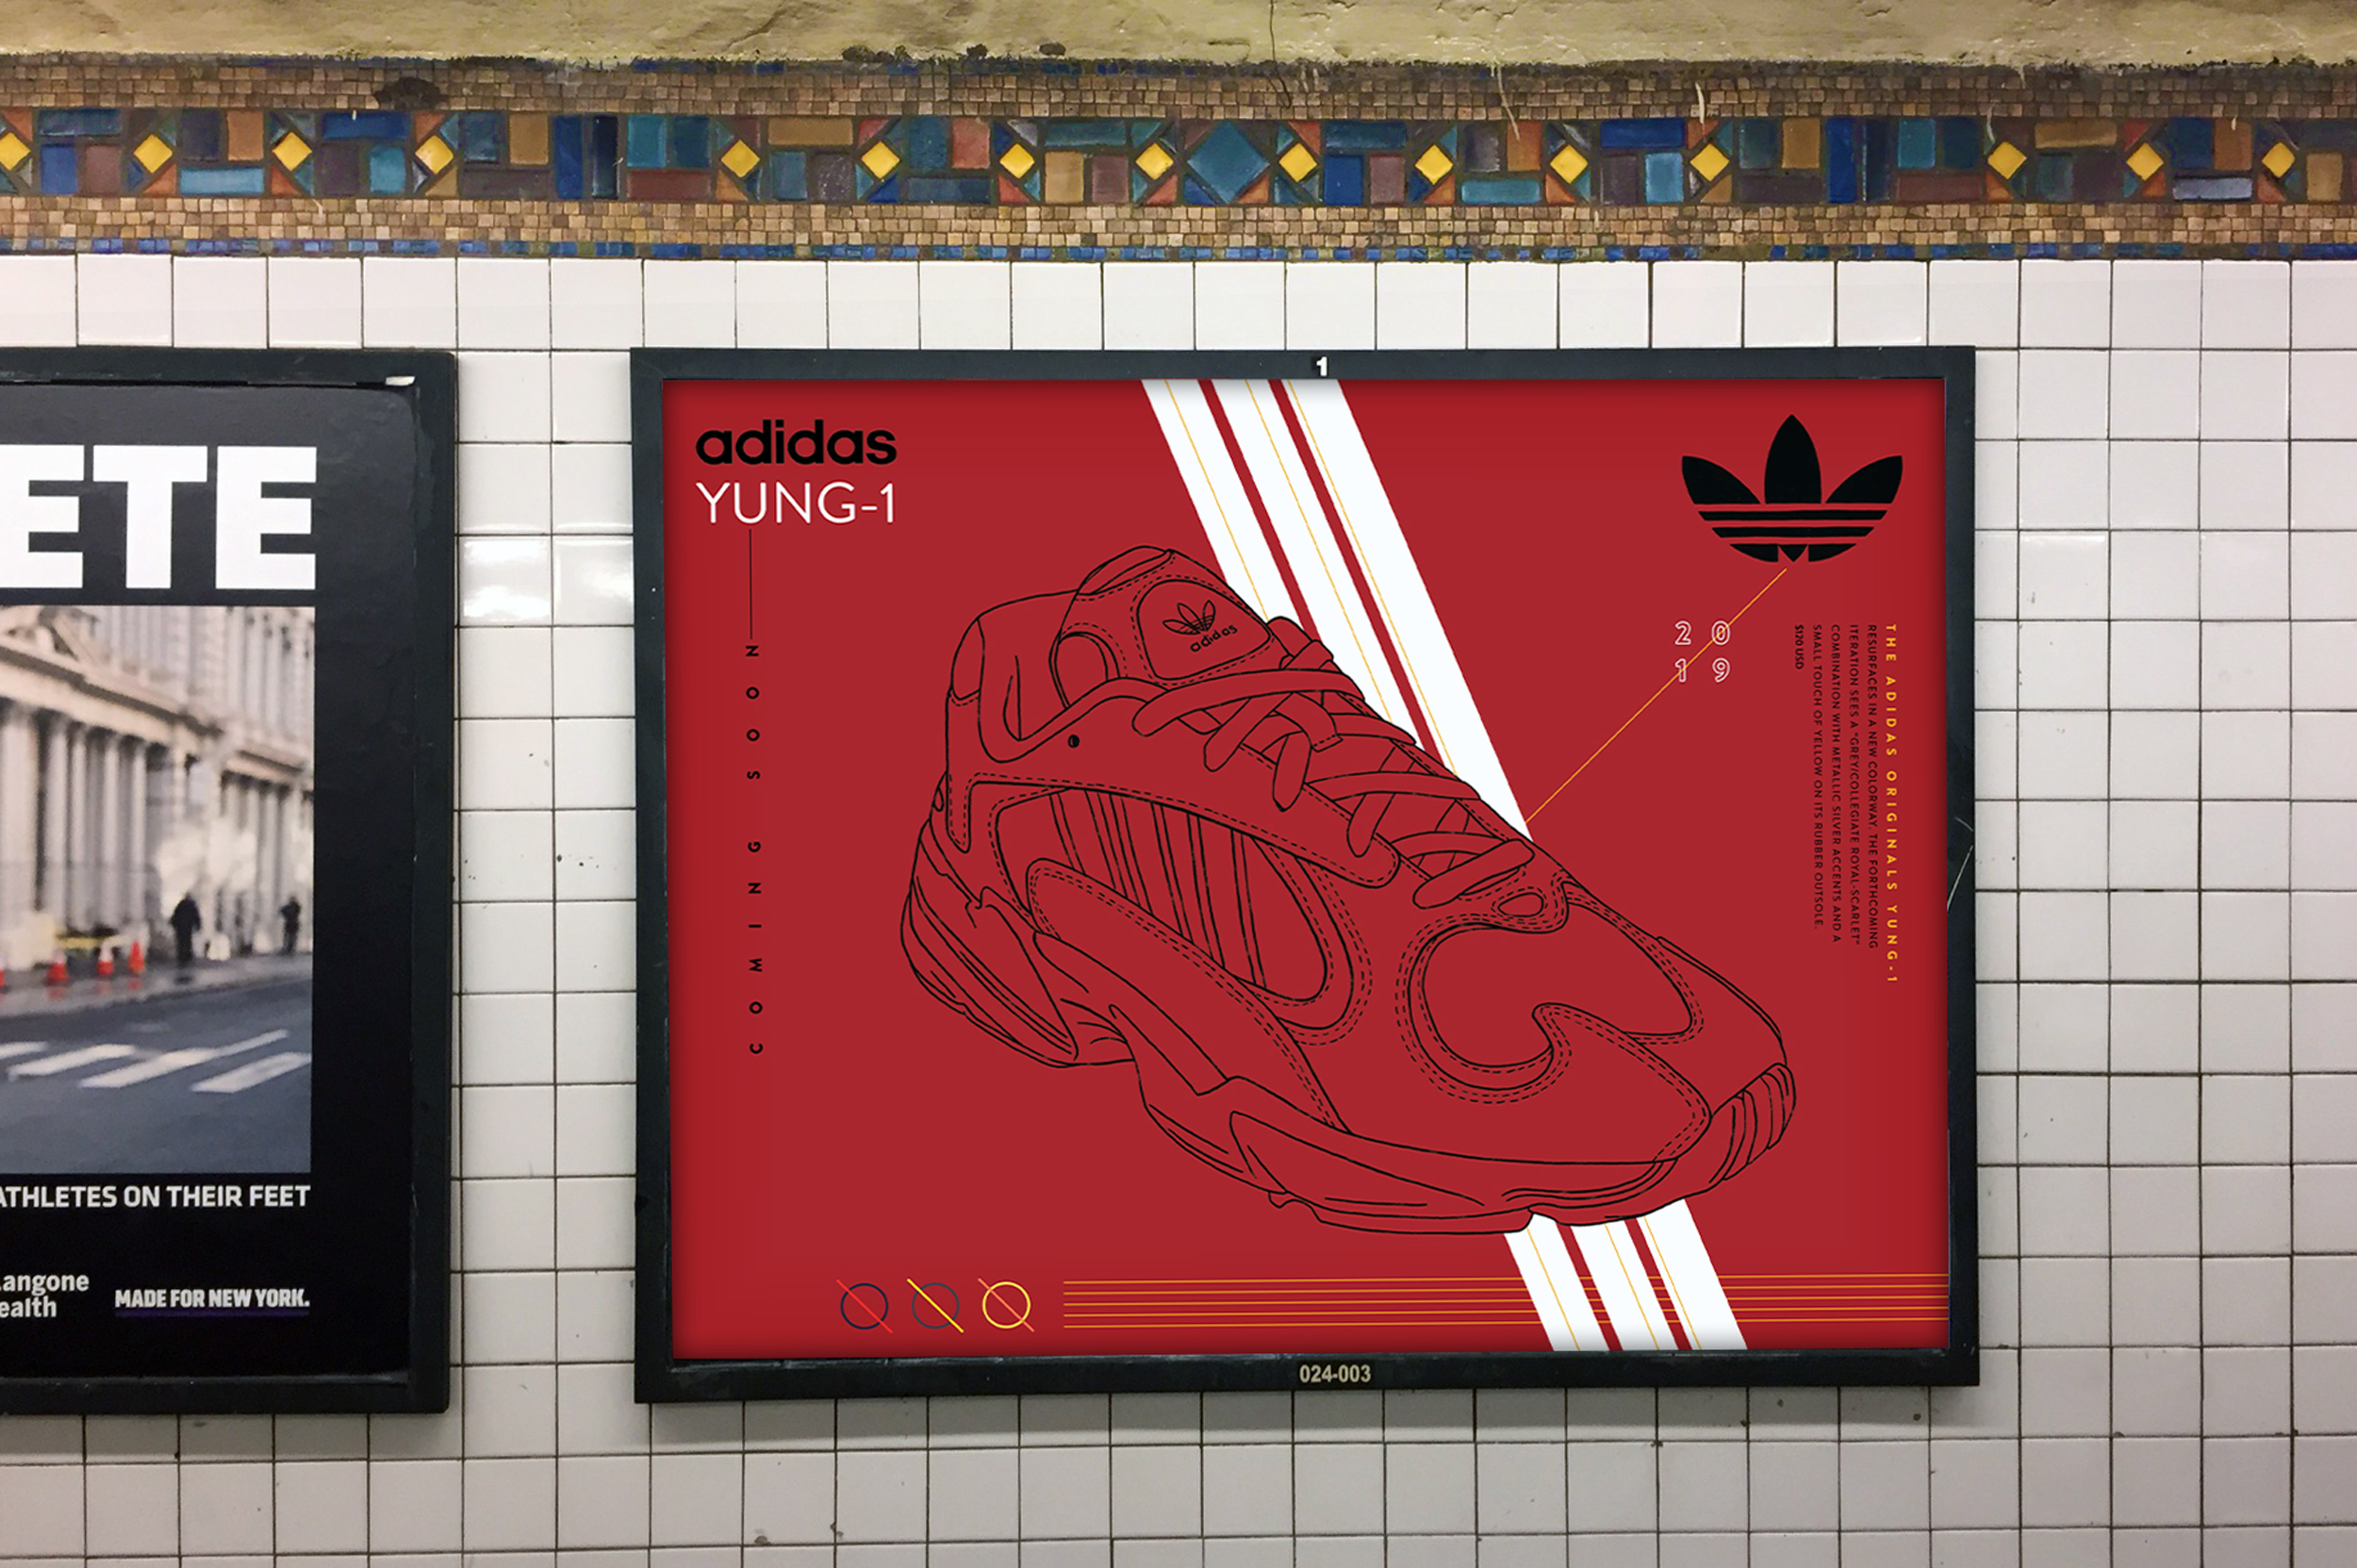 adidas_subway.jpg